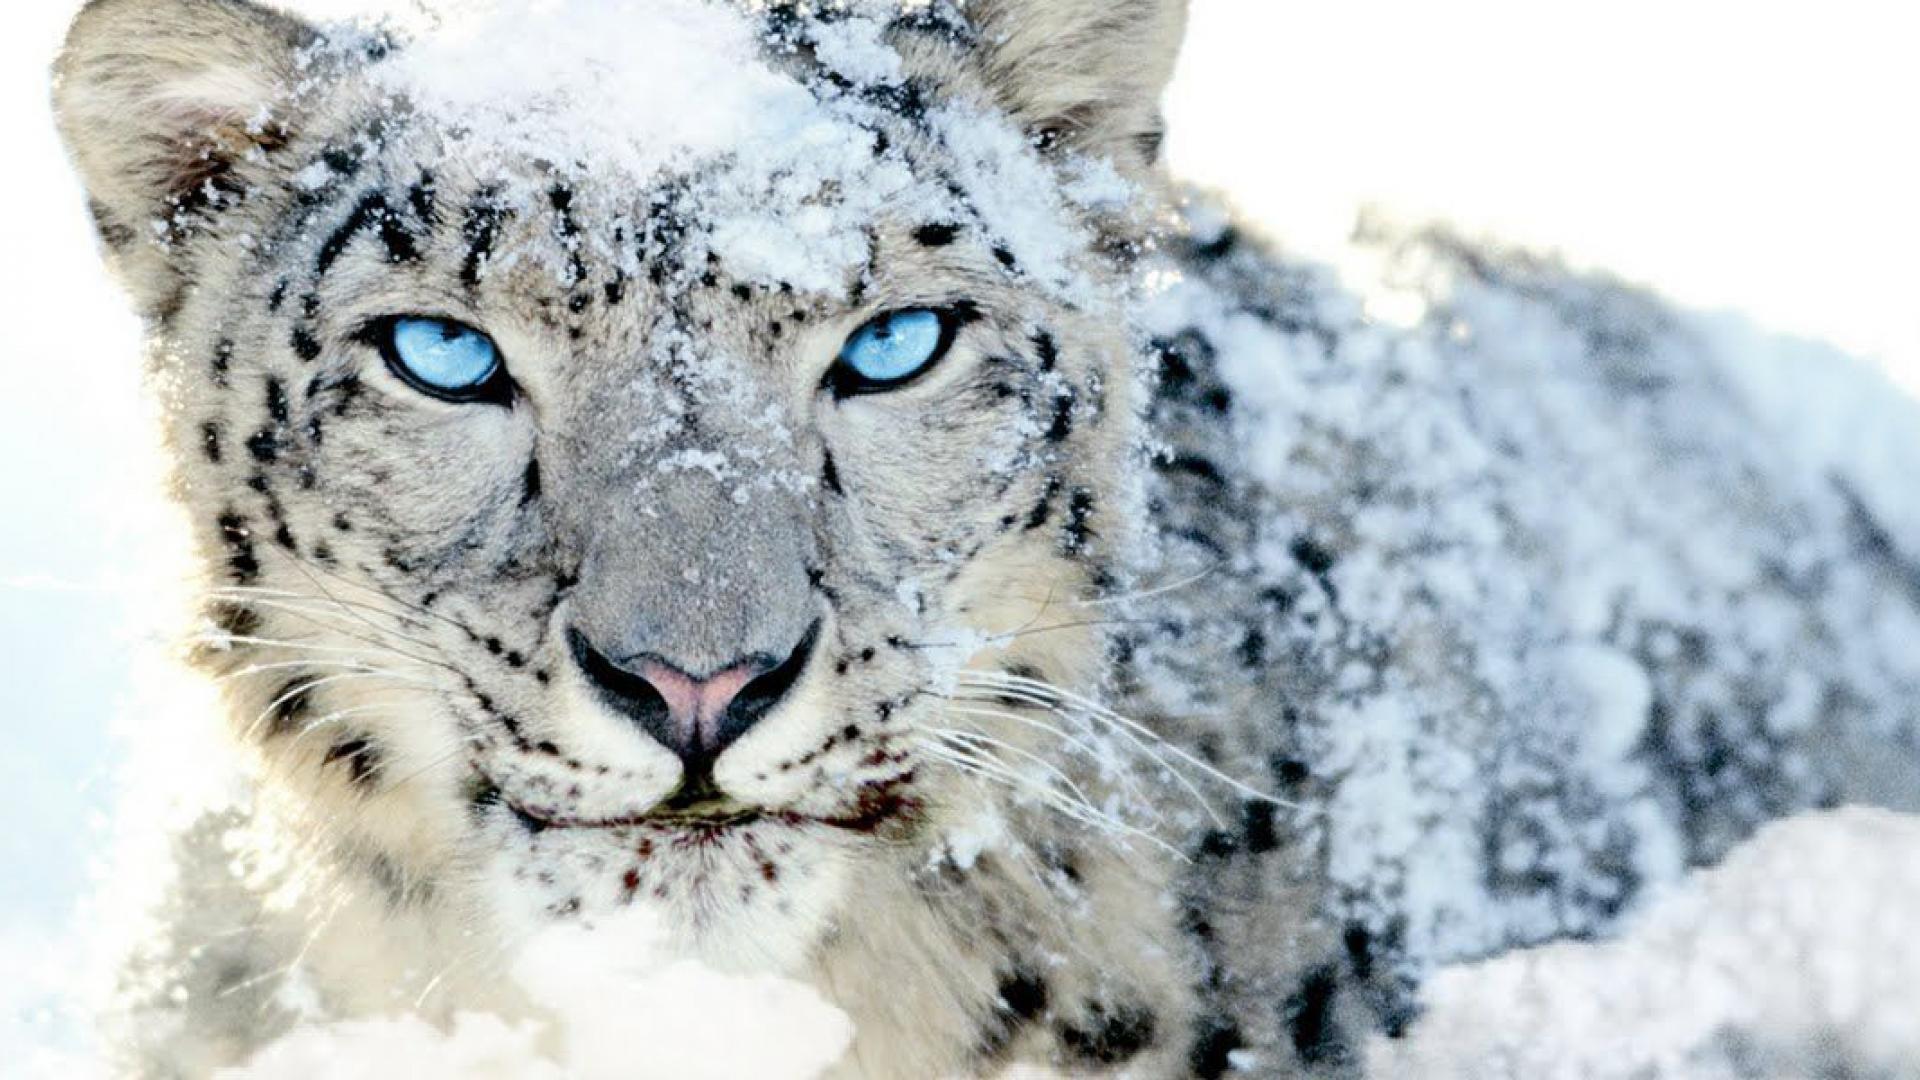 Must see Wallpaper Mac Snow Leopard - Apple-Leopard-Wallpapers-037  Snapshot_646688.jpg